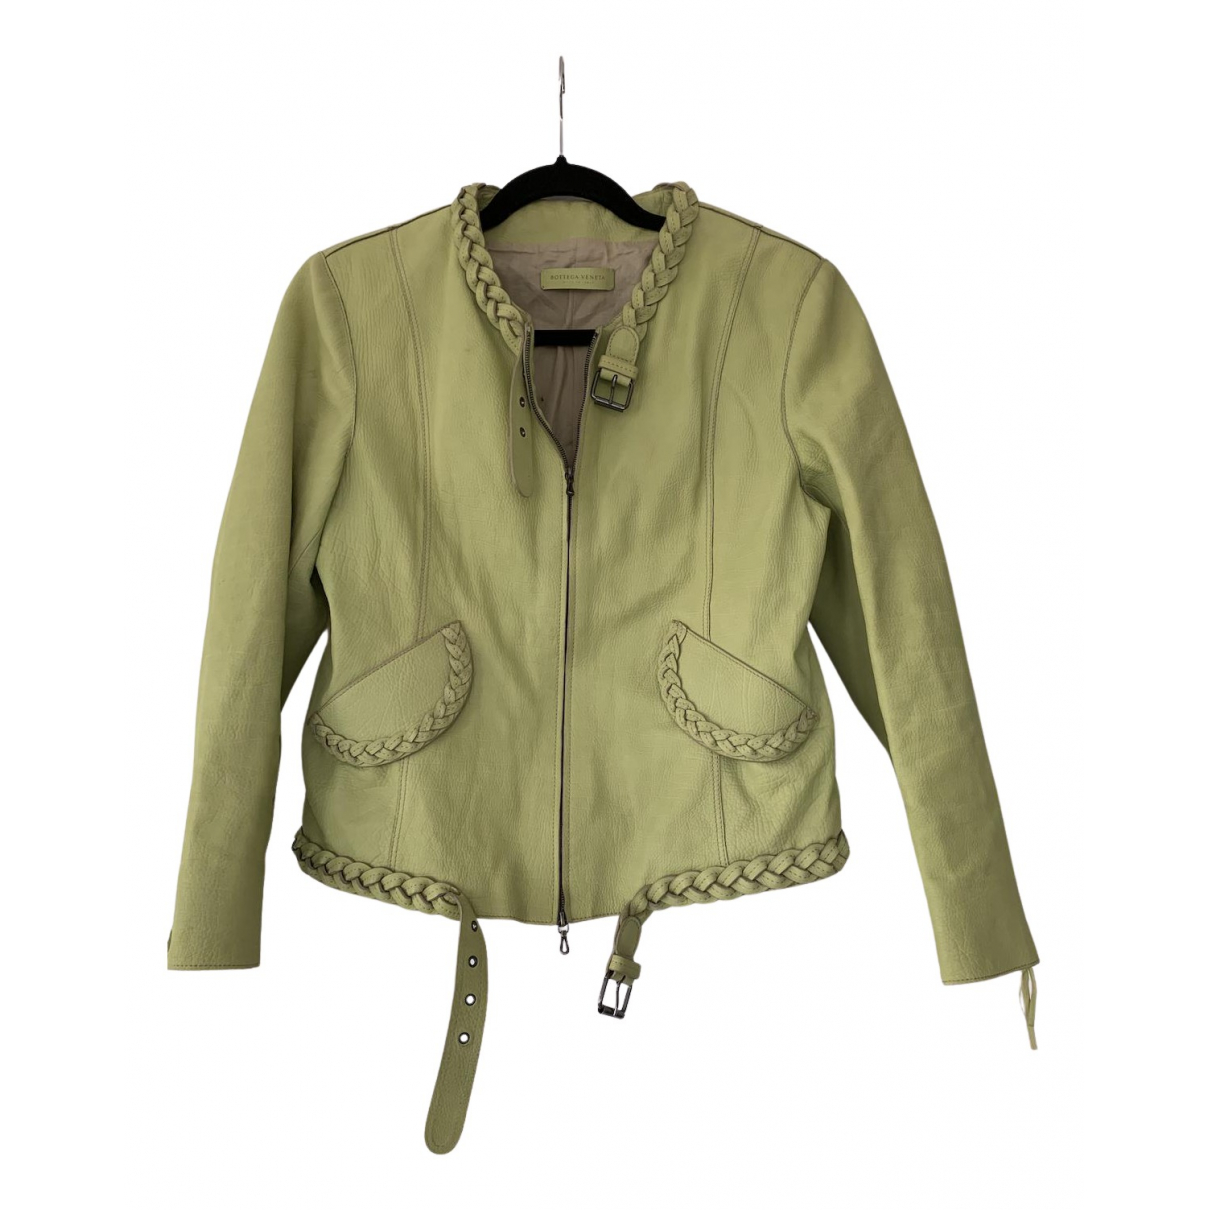 Bottega Veneta N Green Leather Leather jacket for Women 46 IT